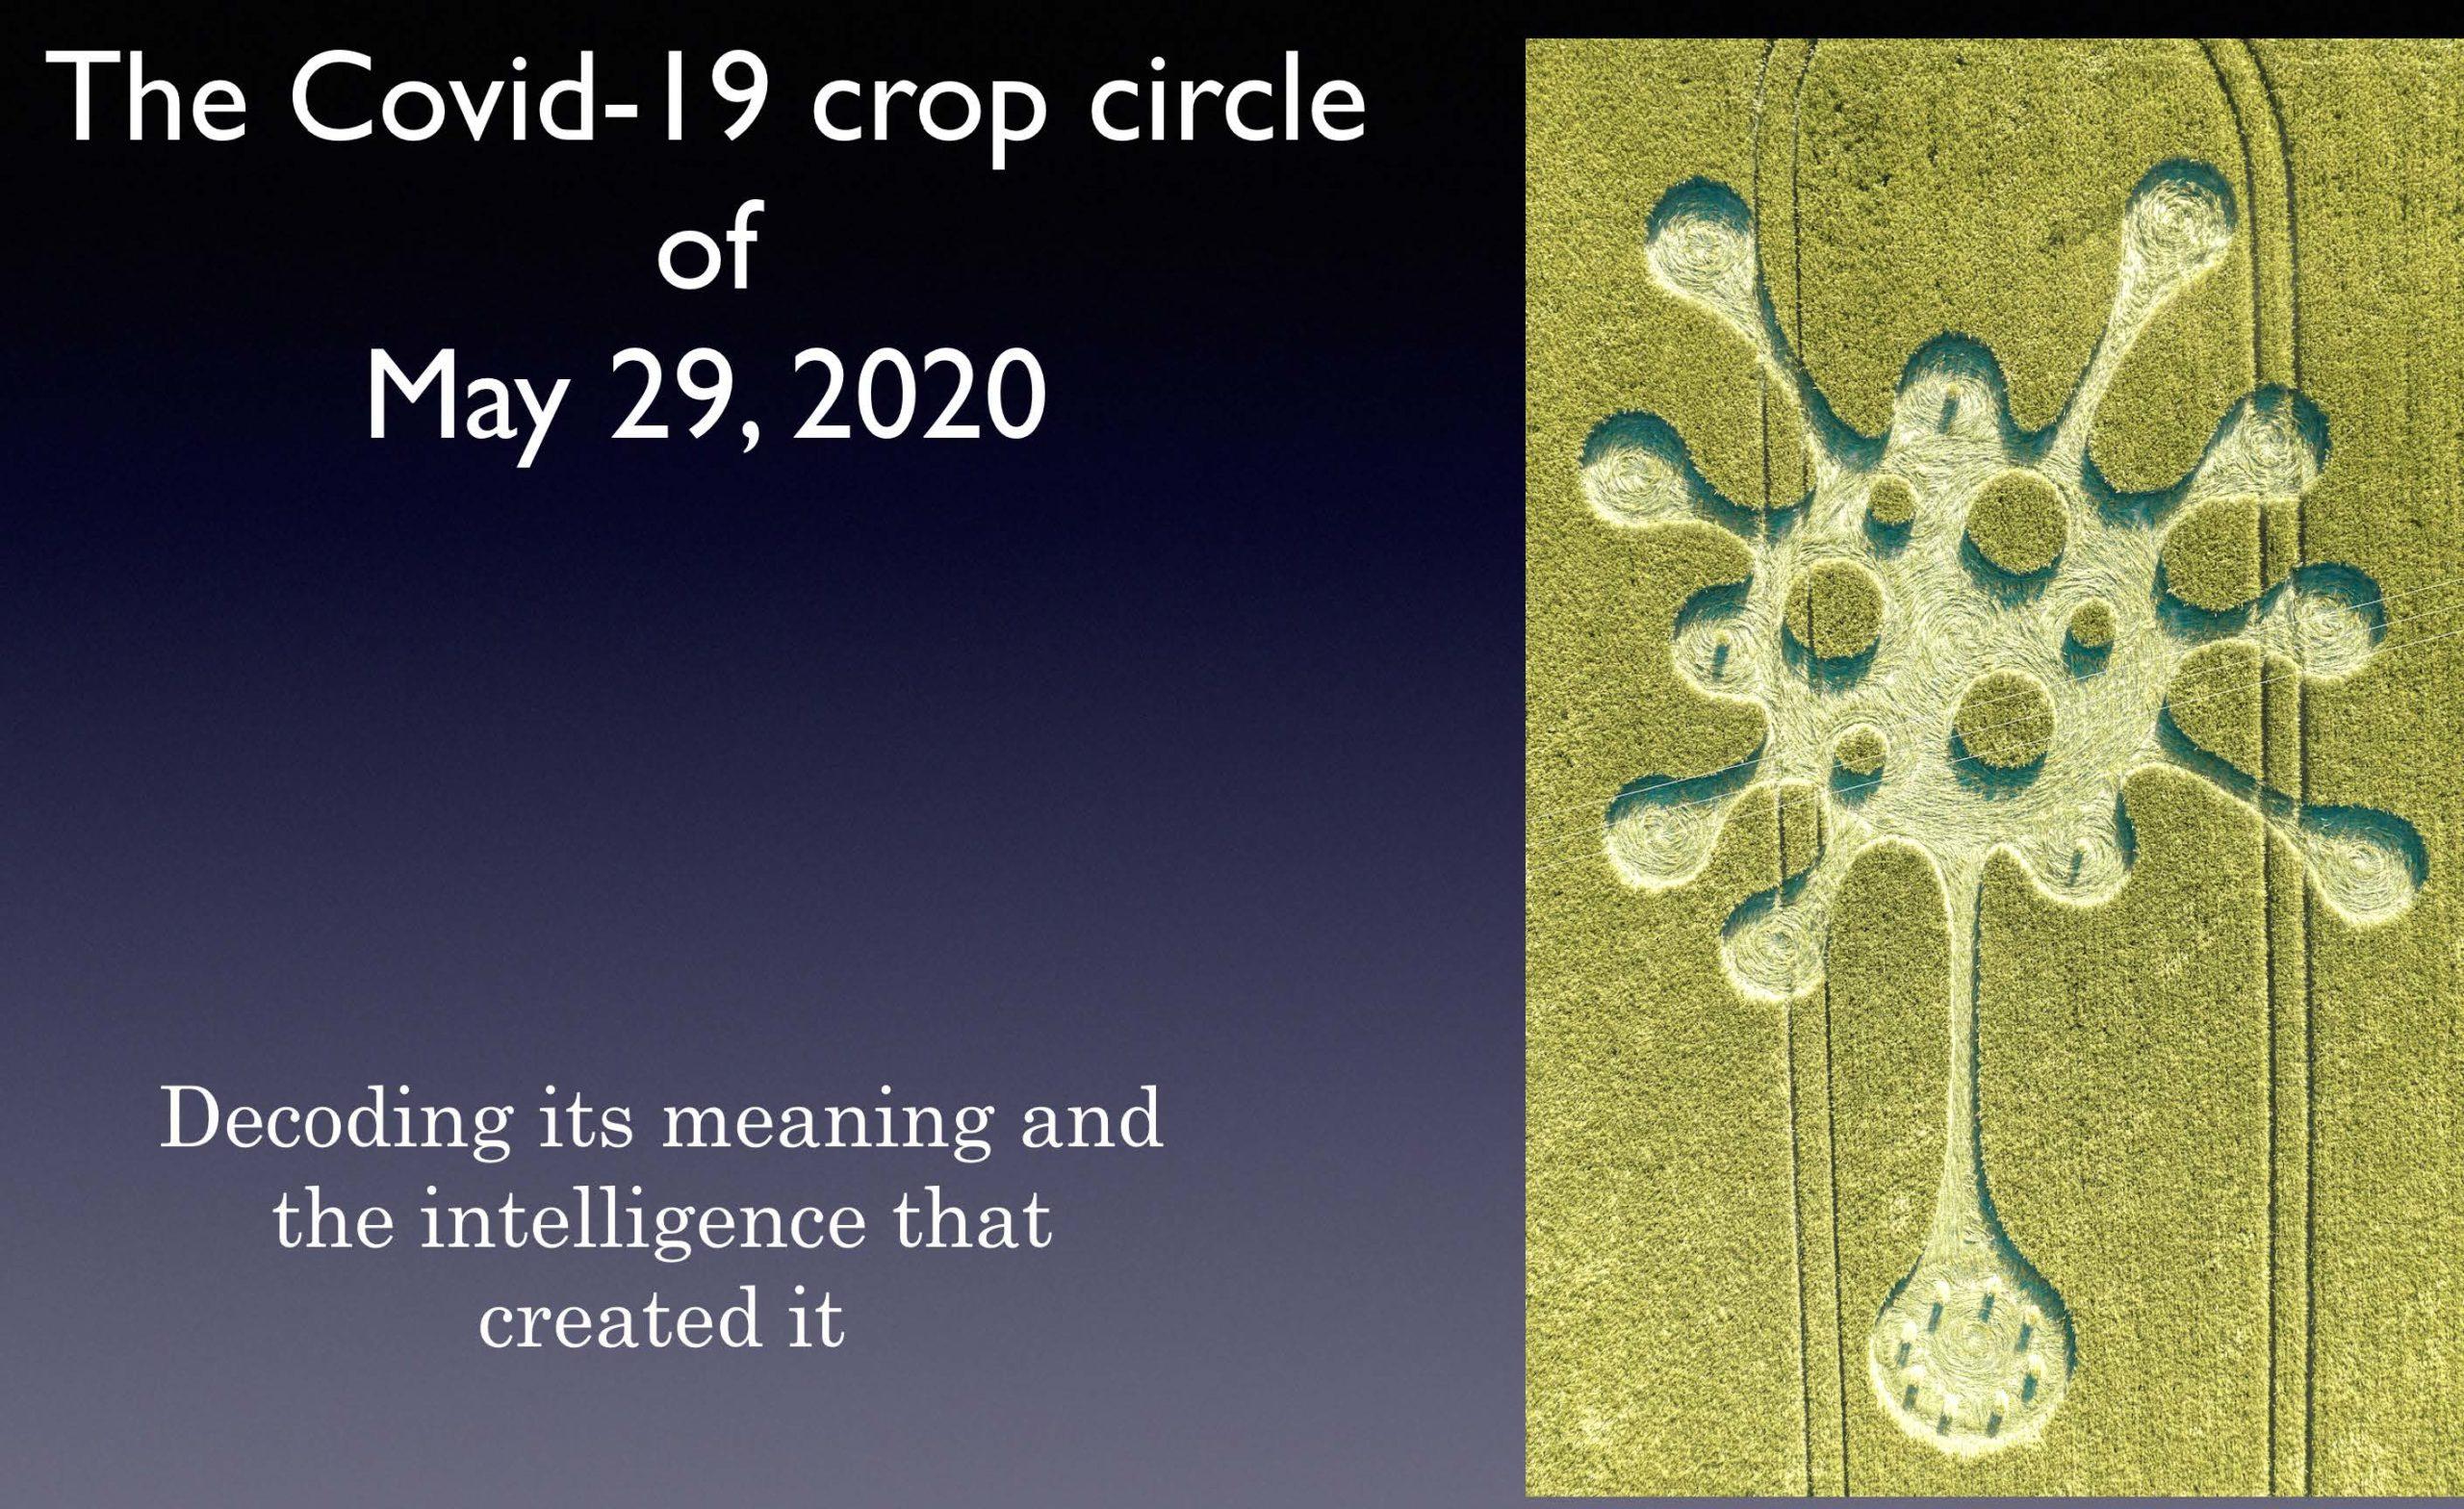 COVID-19 crop circle